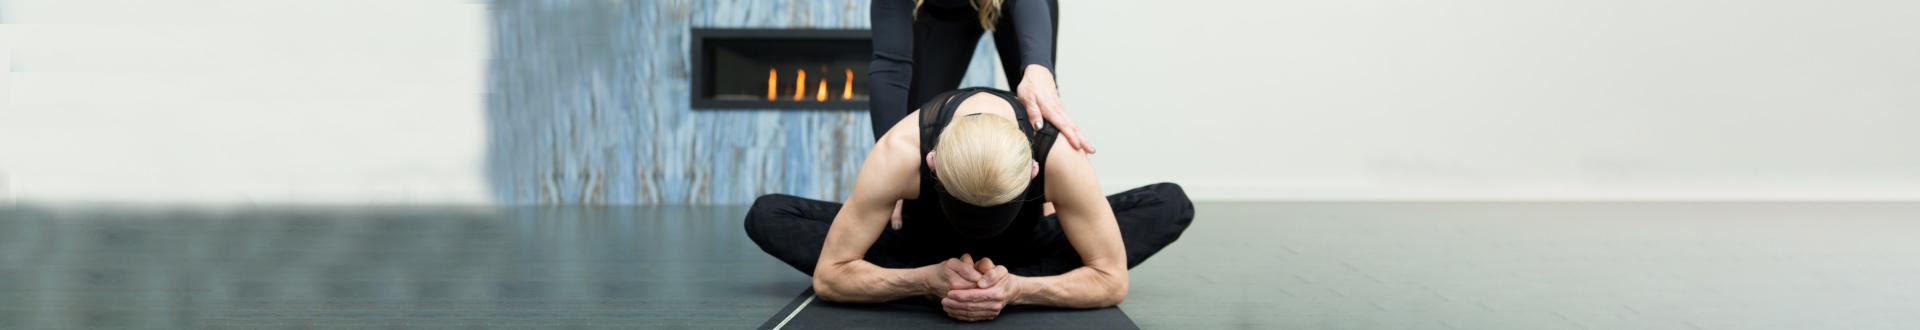 woman guiding a person doing yoga